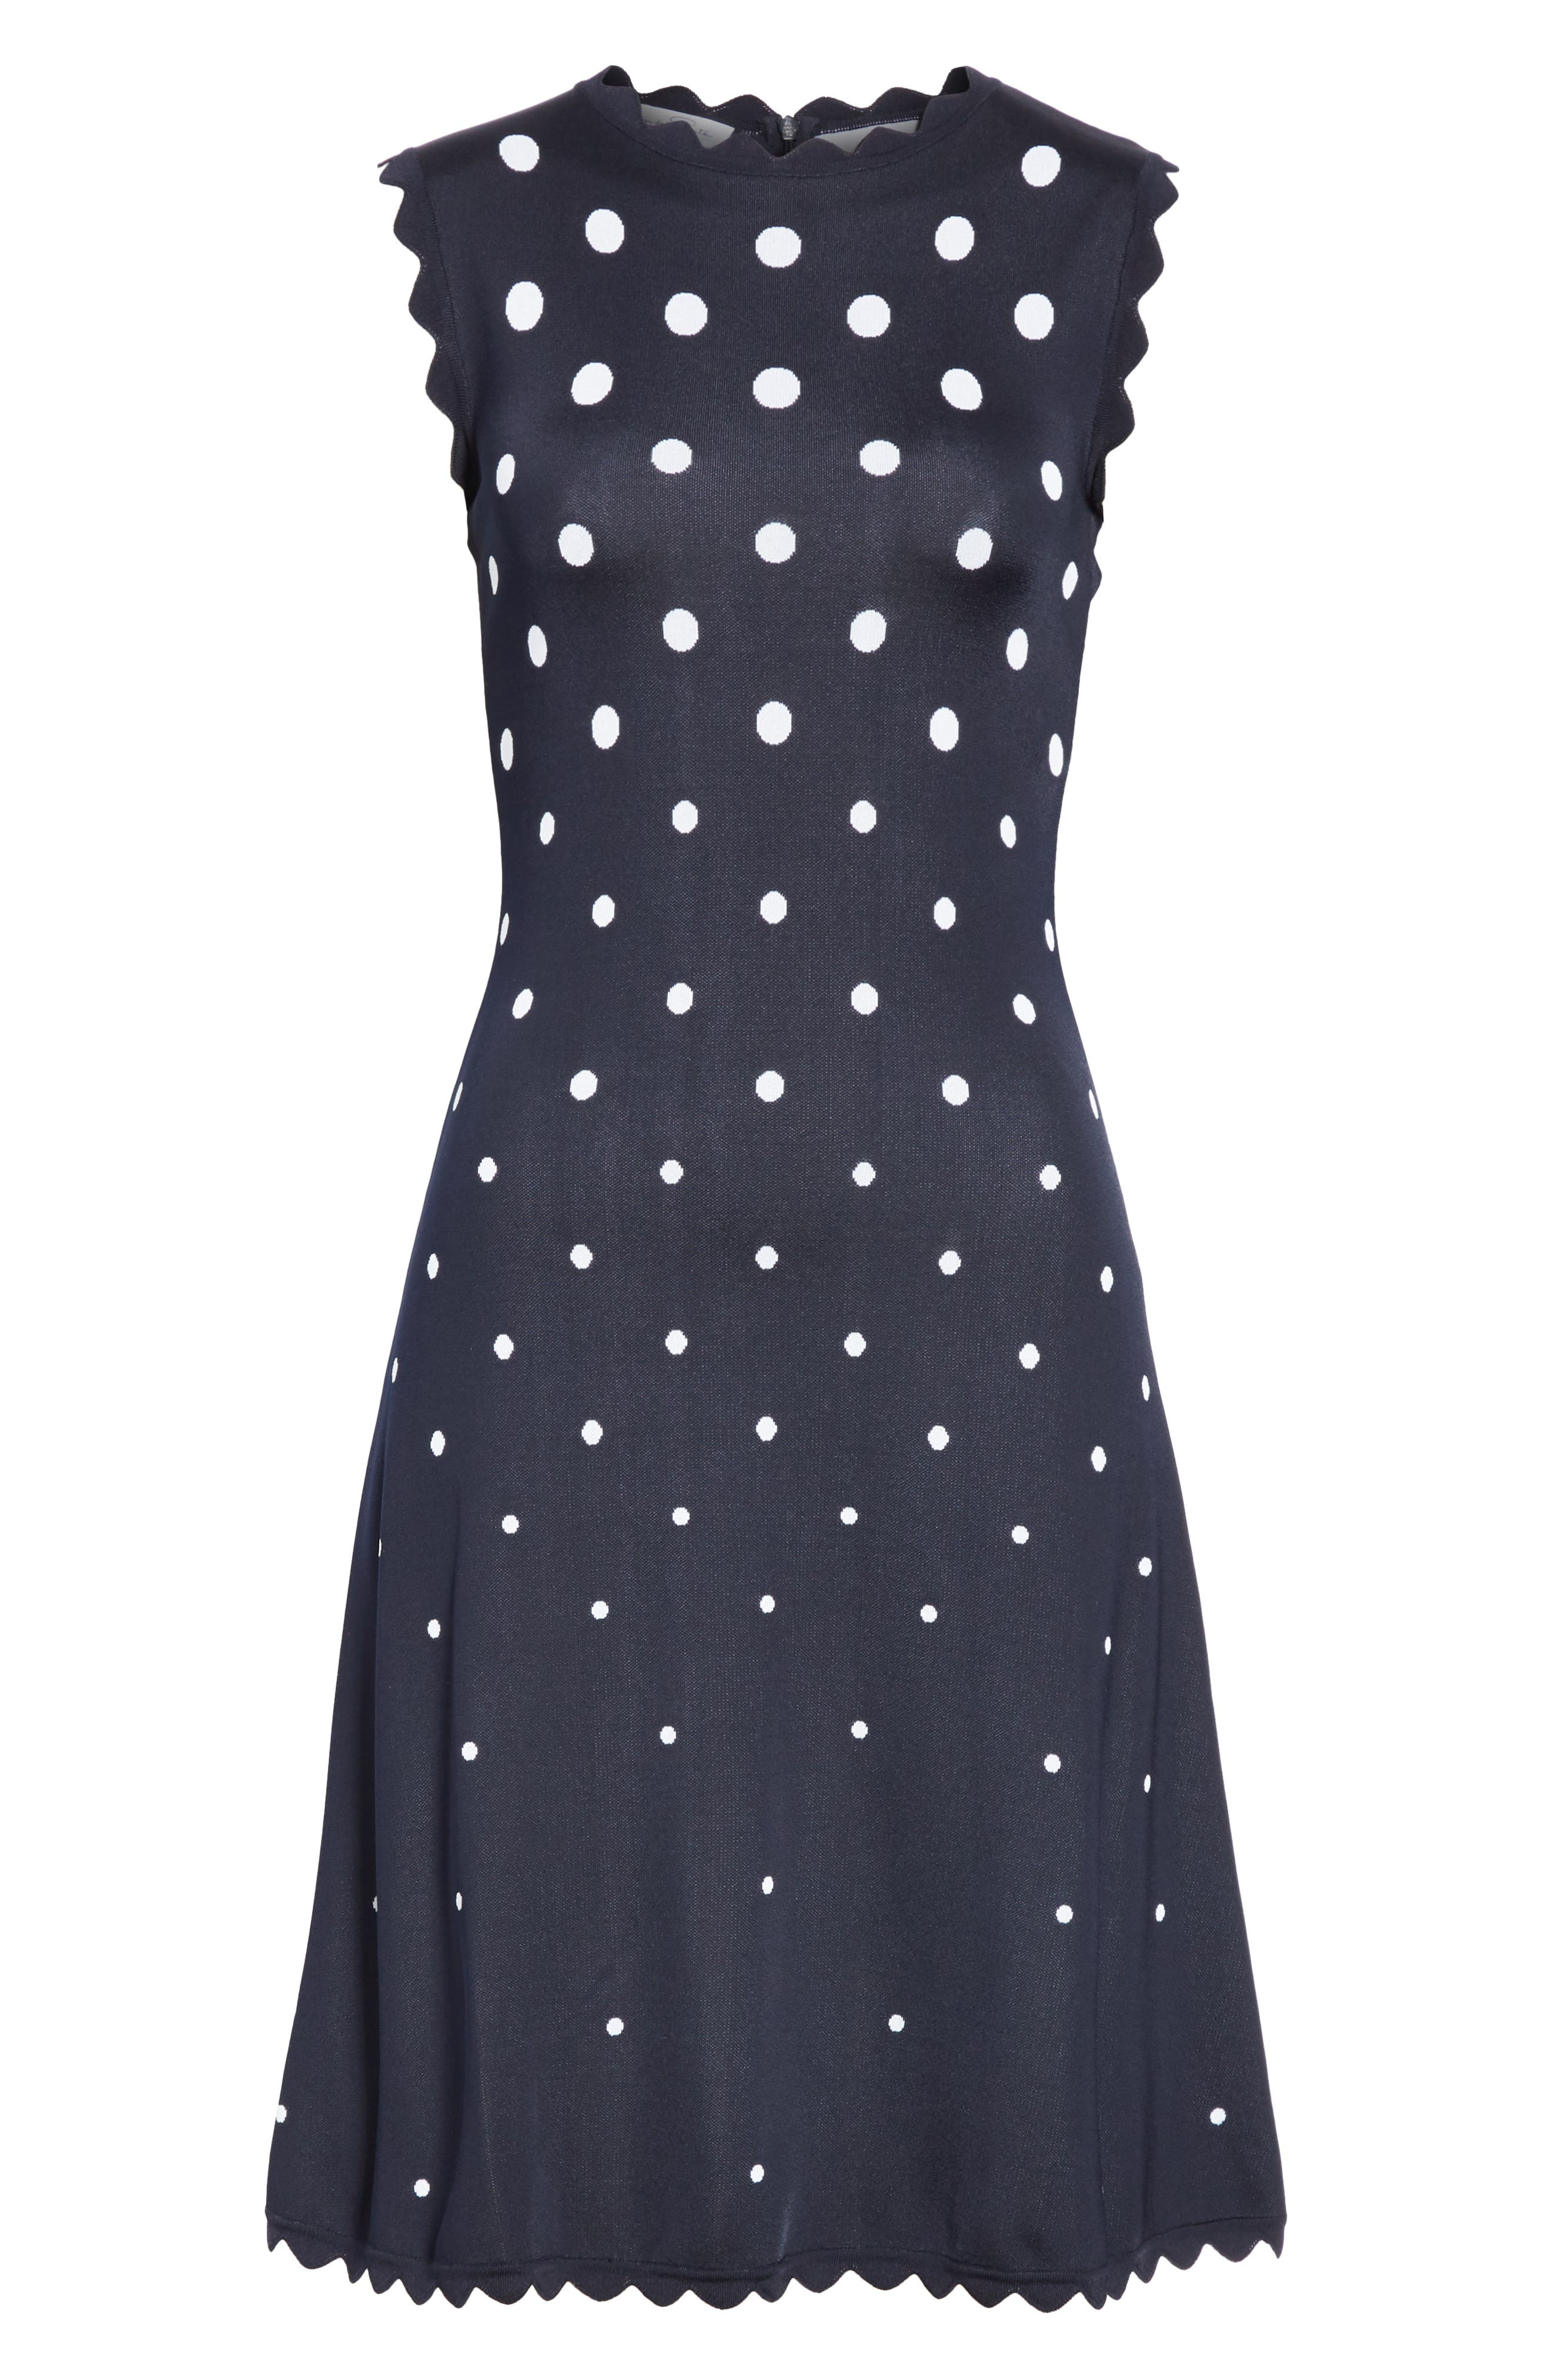 Scallop Edge Polka Dot A-Line Dress,                             Alternate thumbnail 7, color,                             NVW-NAVY/ WHITE